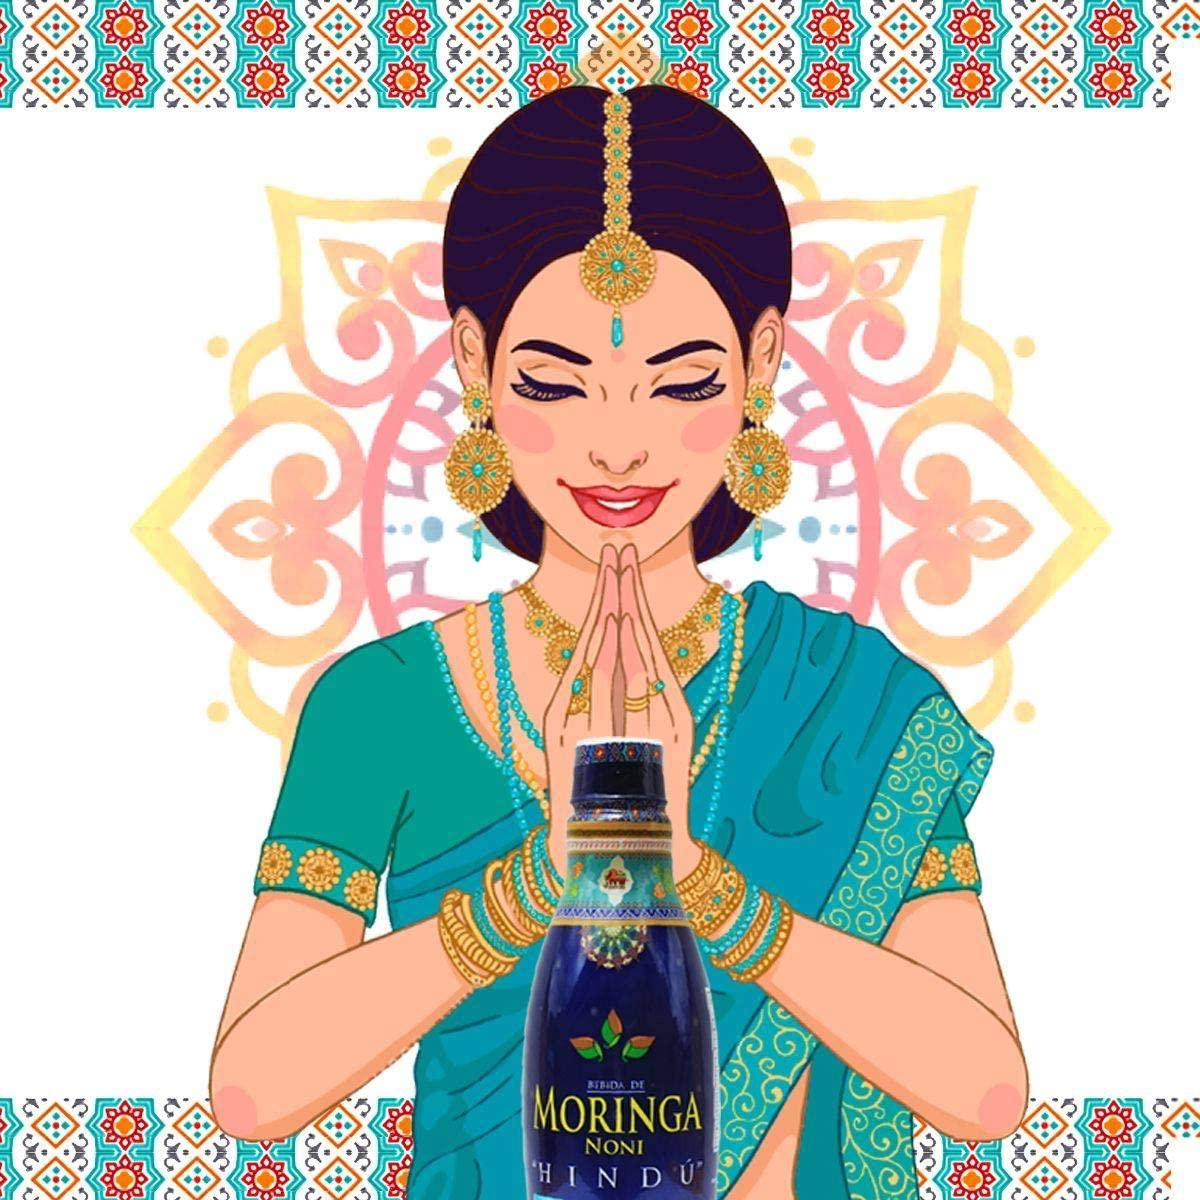 Moringa Noni Hindu